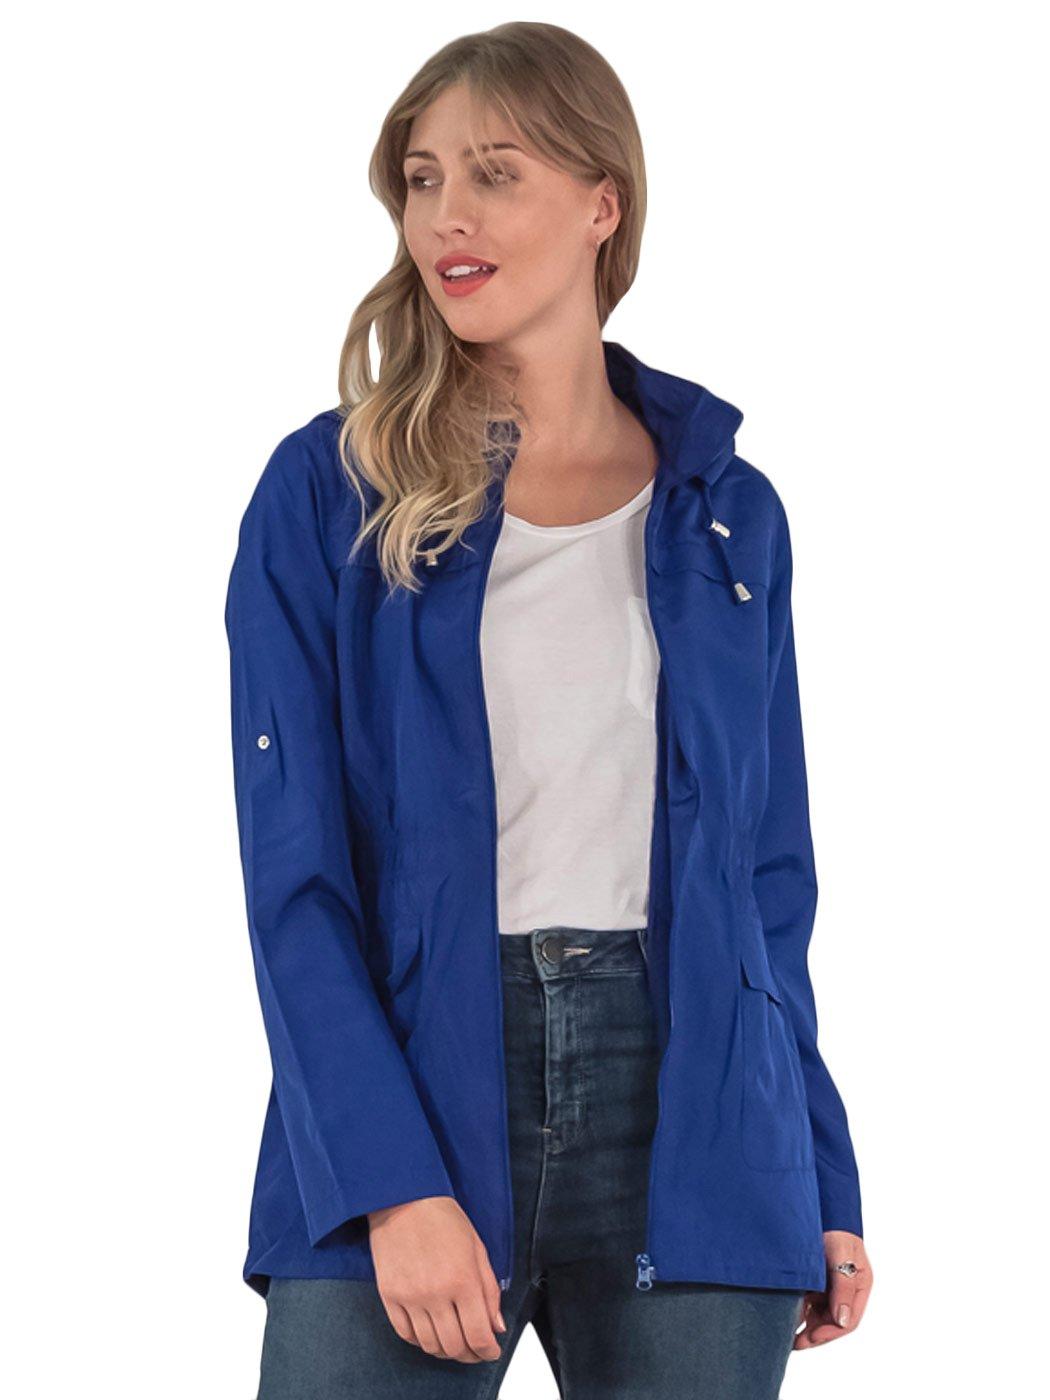 Womens-RainCoat-Plain-Hooded-Ladies-Jacket-Kagool-Parka-Long-Sleeves-Two-Pockets thumbnail 20